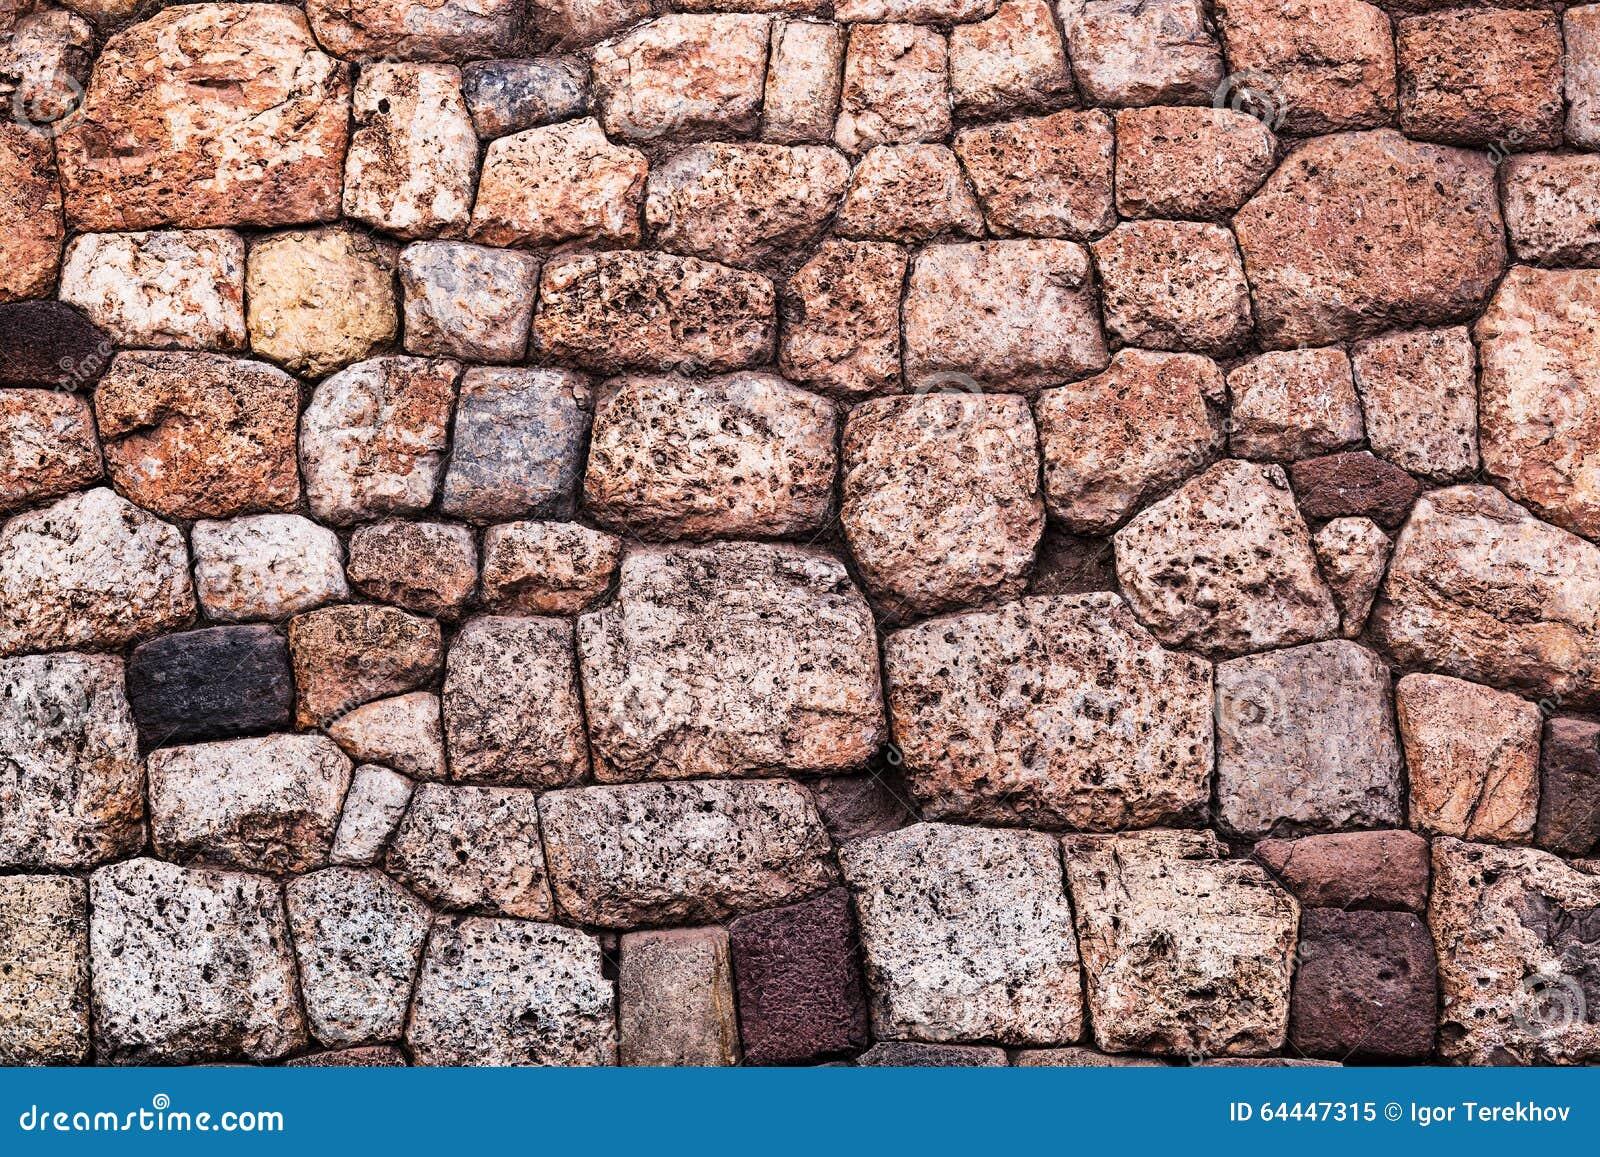 Brick Work | Solid Masonry